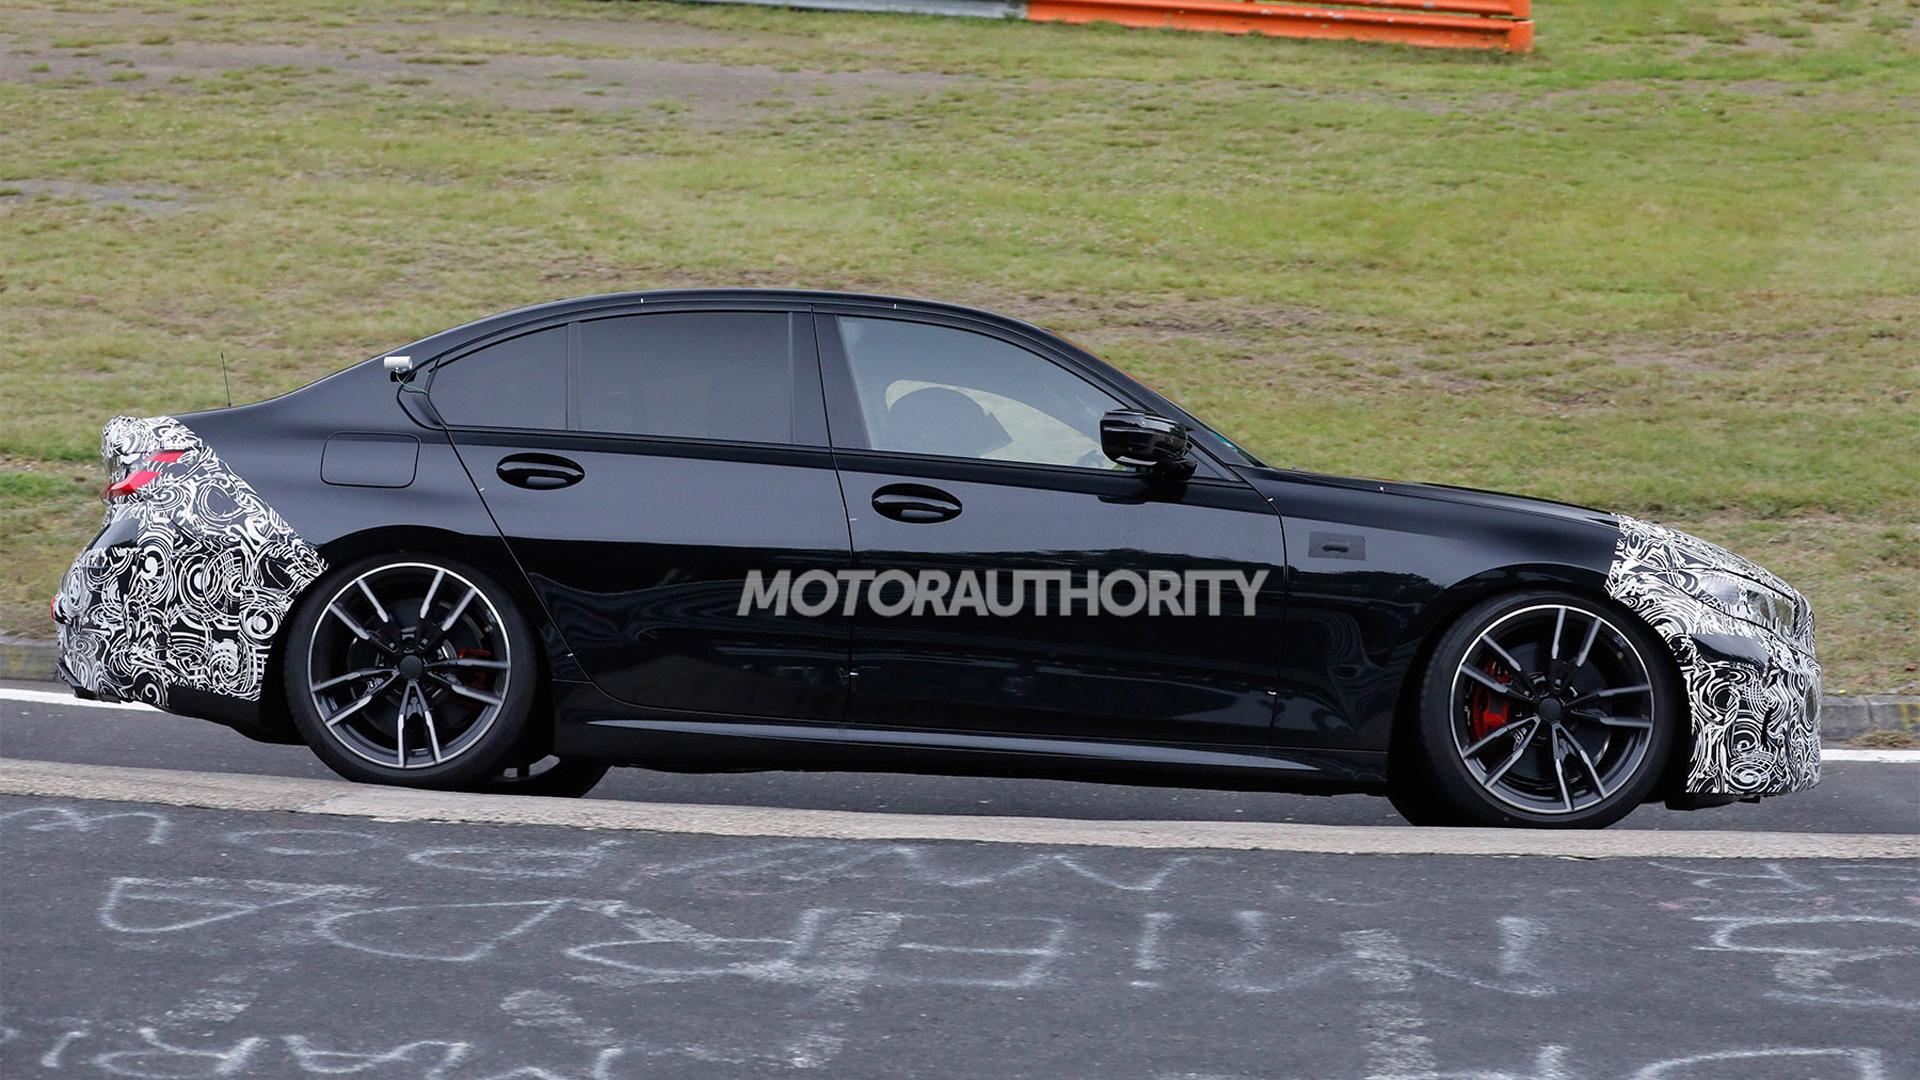 2023 BMW 3-Series facelift spy shots - Photo credit:S. Baldauf/SB-Medien